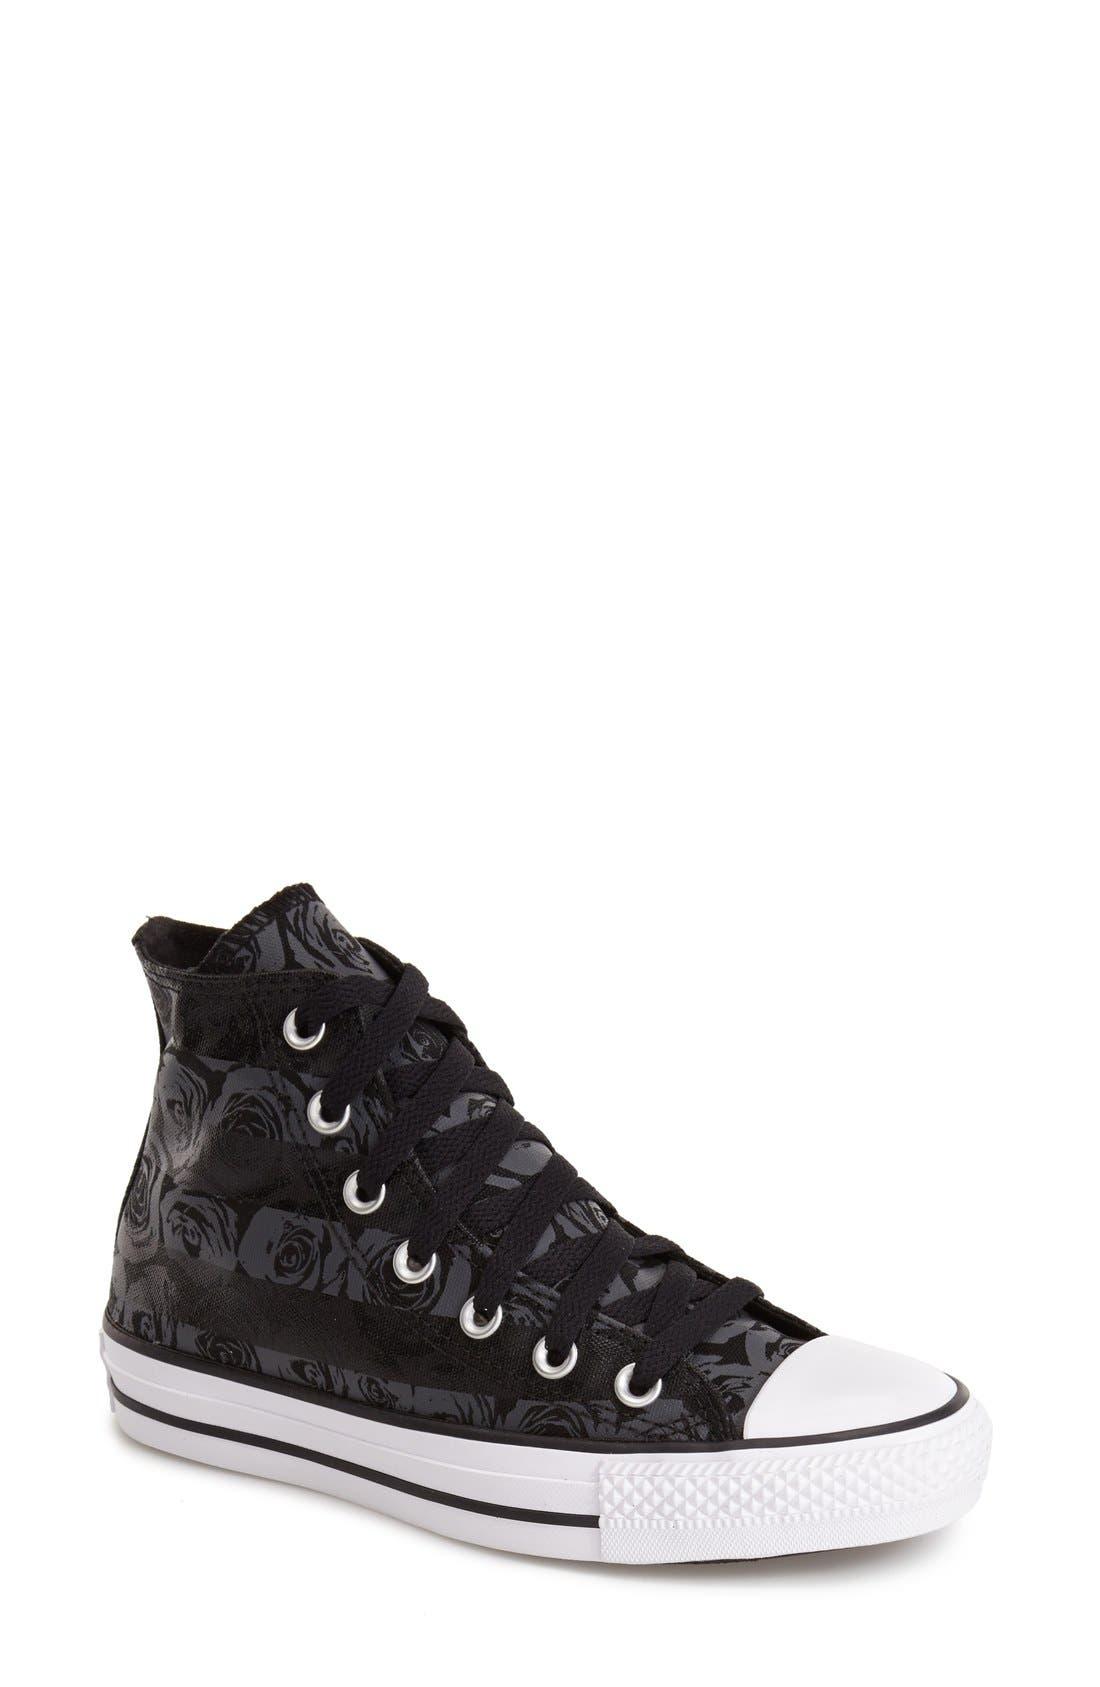 Main Image - Converse Chuck Taylor® All Star® Rose Print High Top Sneaker (Women)